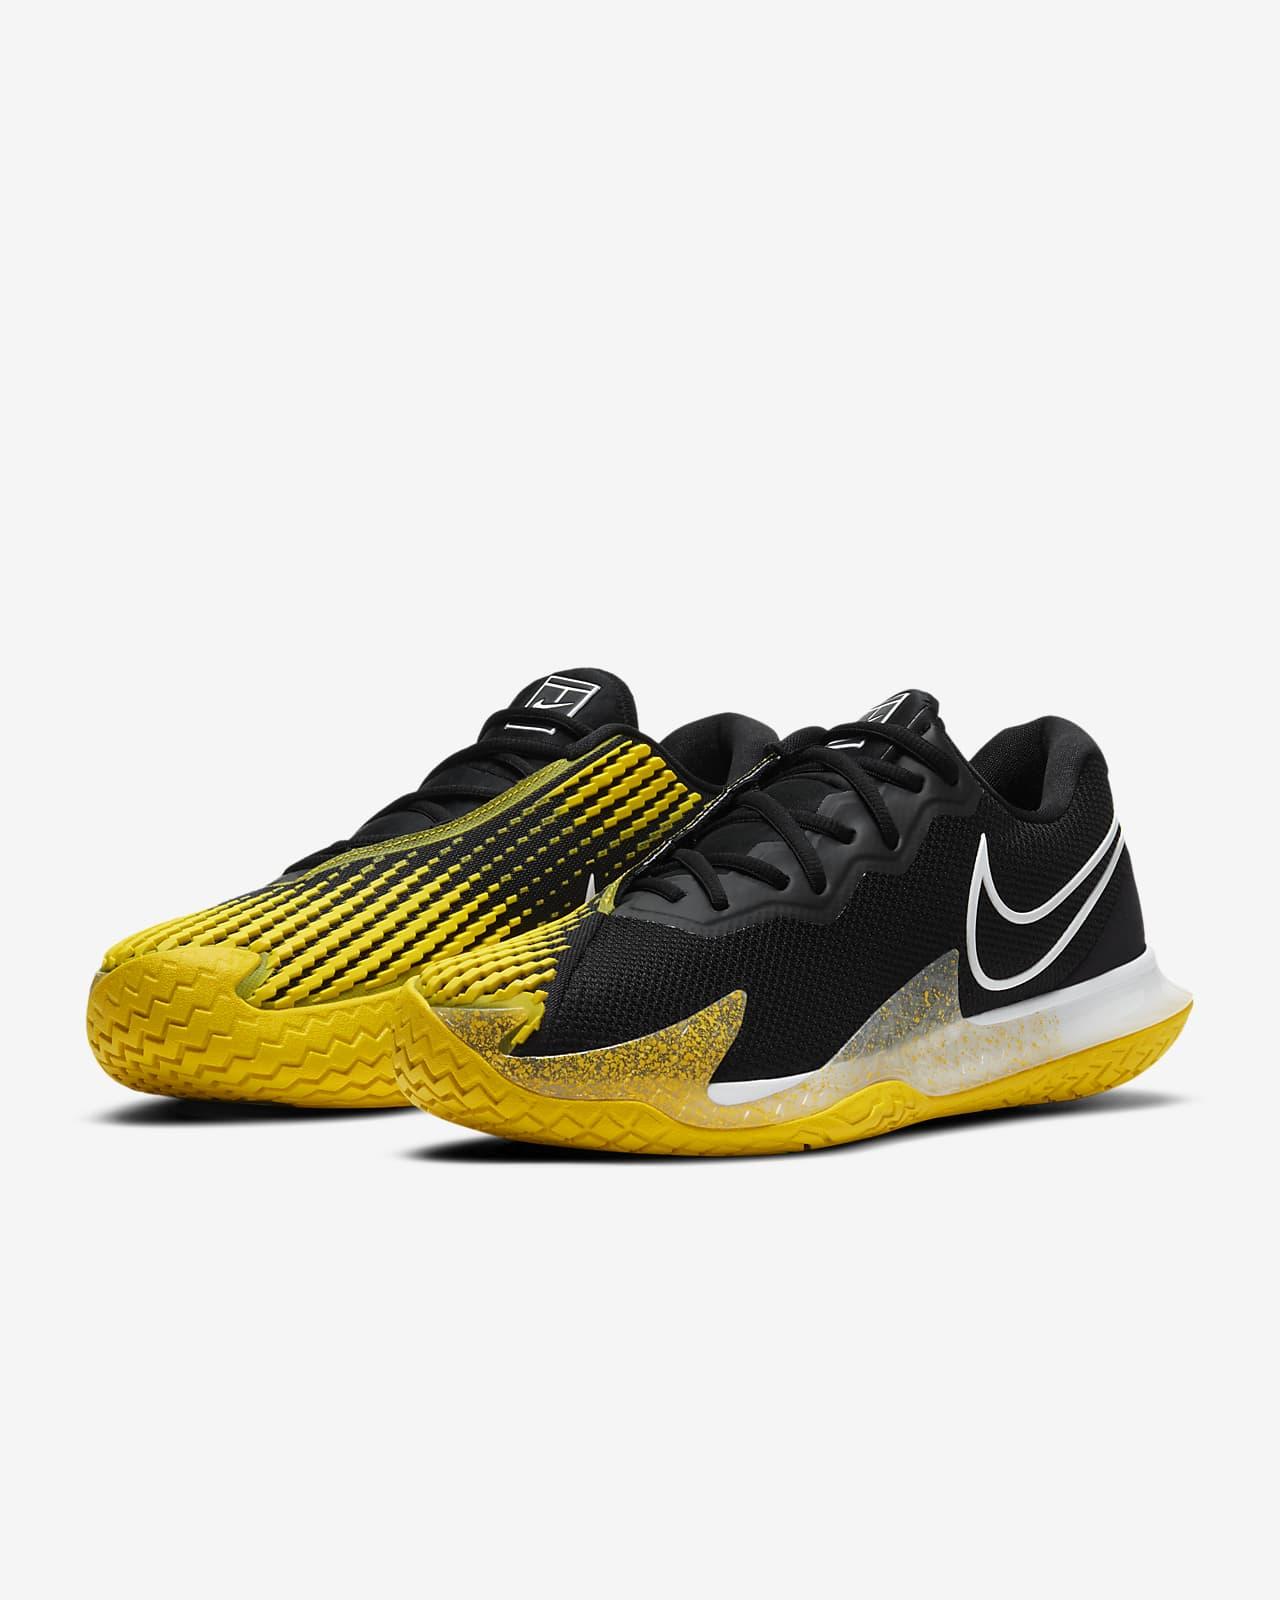 NikeCourt Air Zoom Vapor Cage 4 Men's